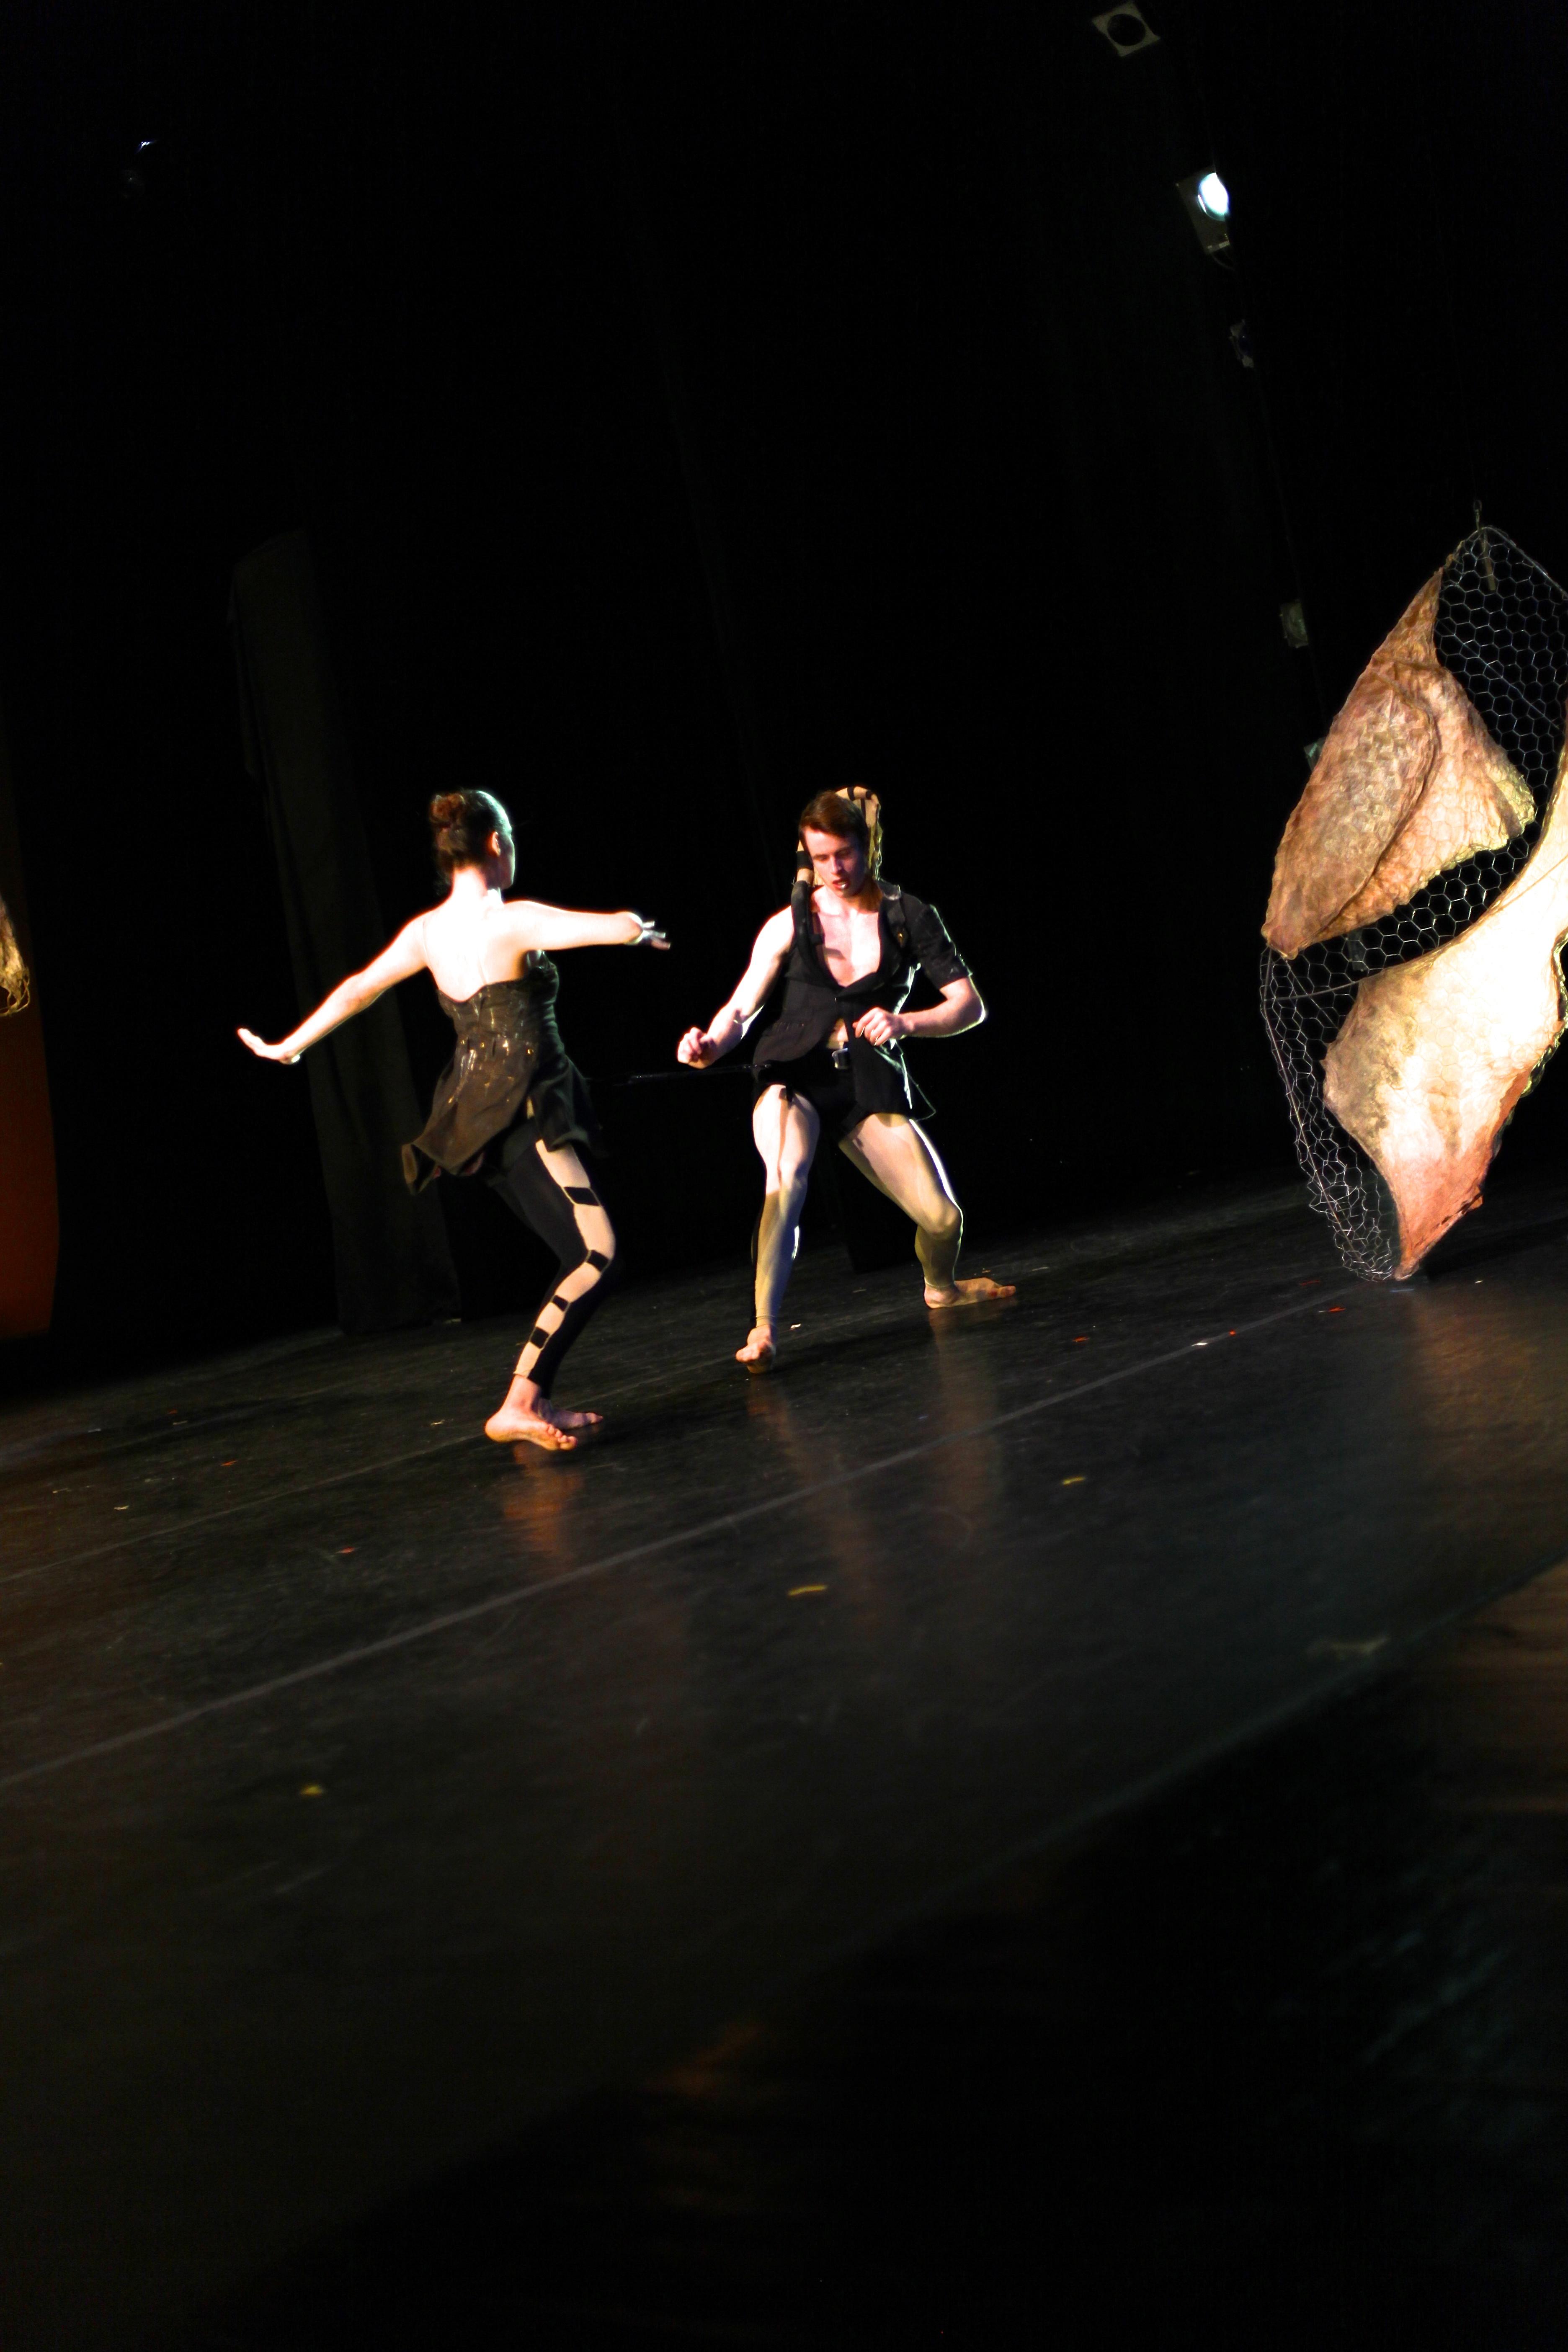 Tamara_Design_Scrap_Dance_NYU_8